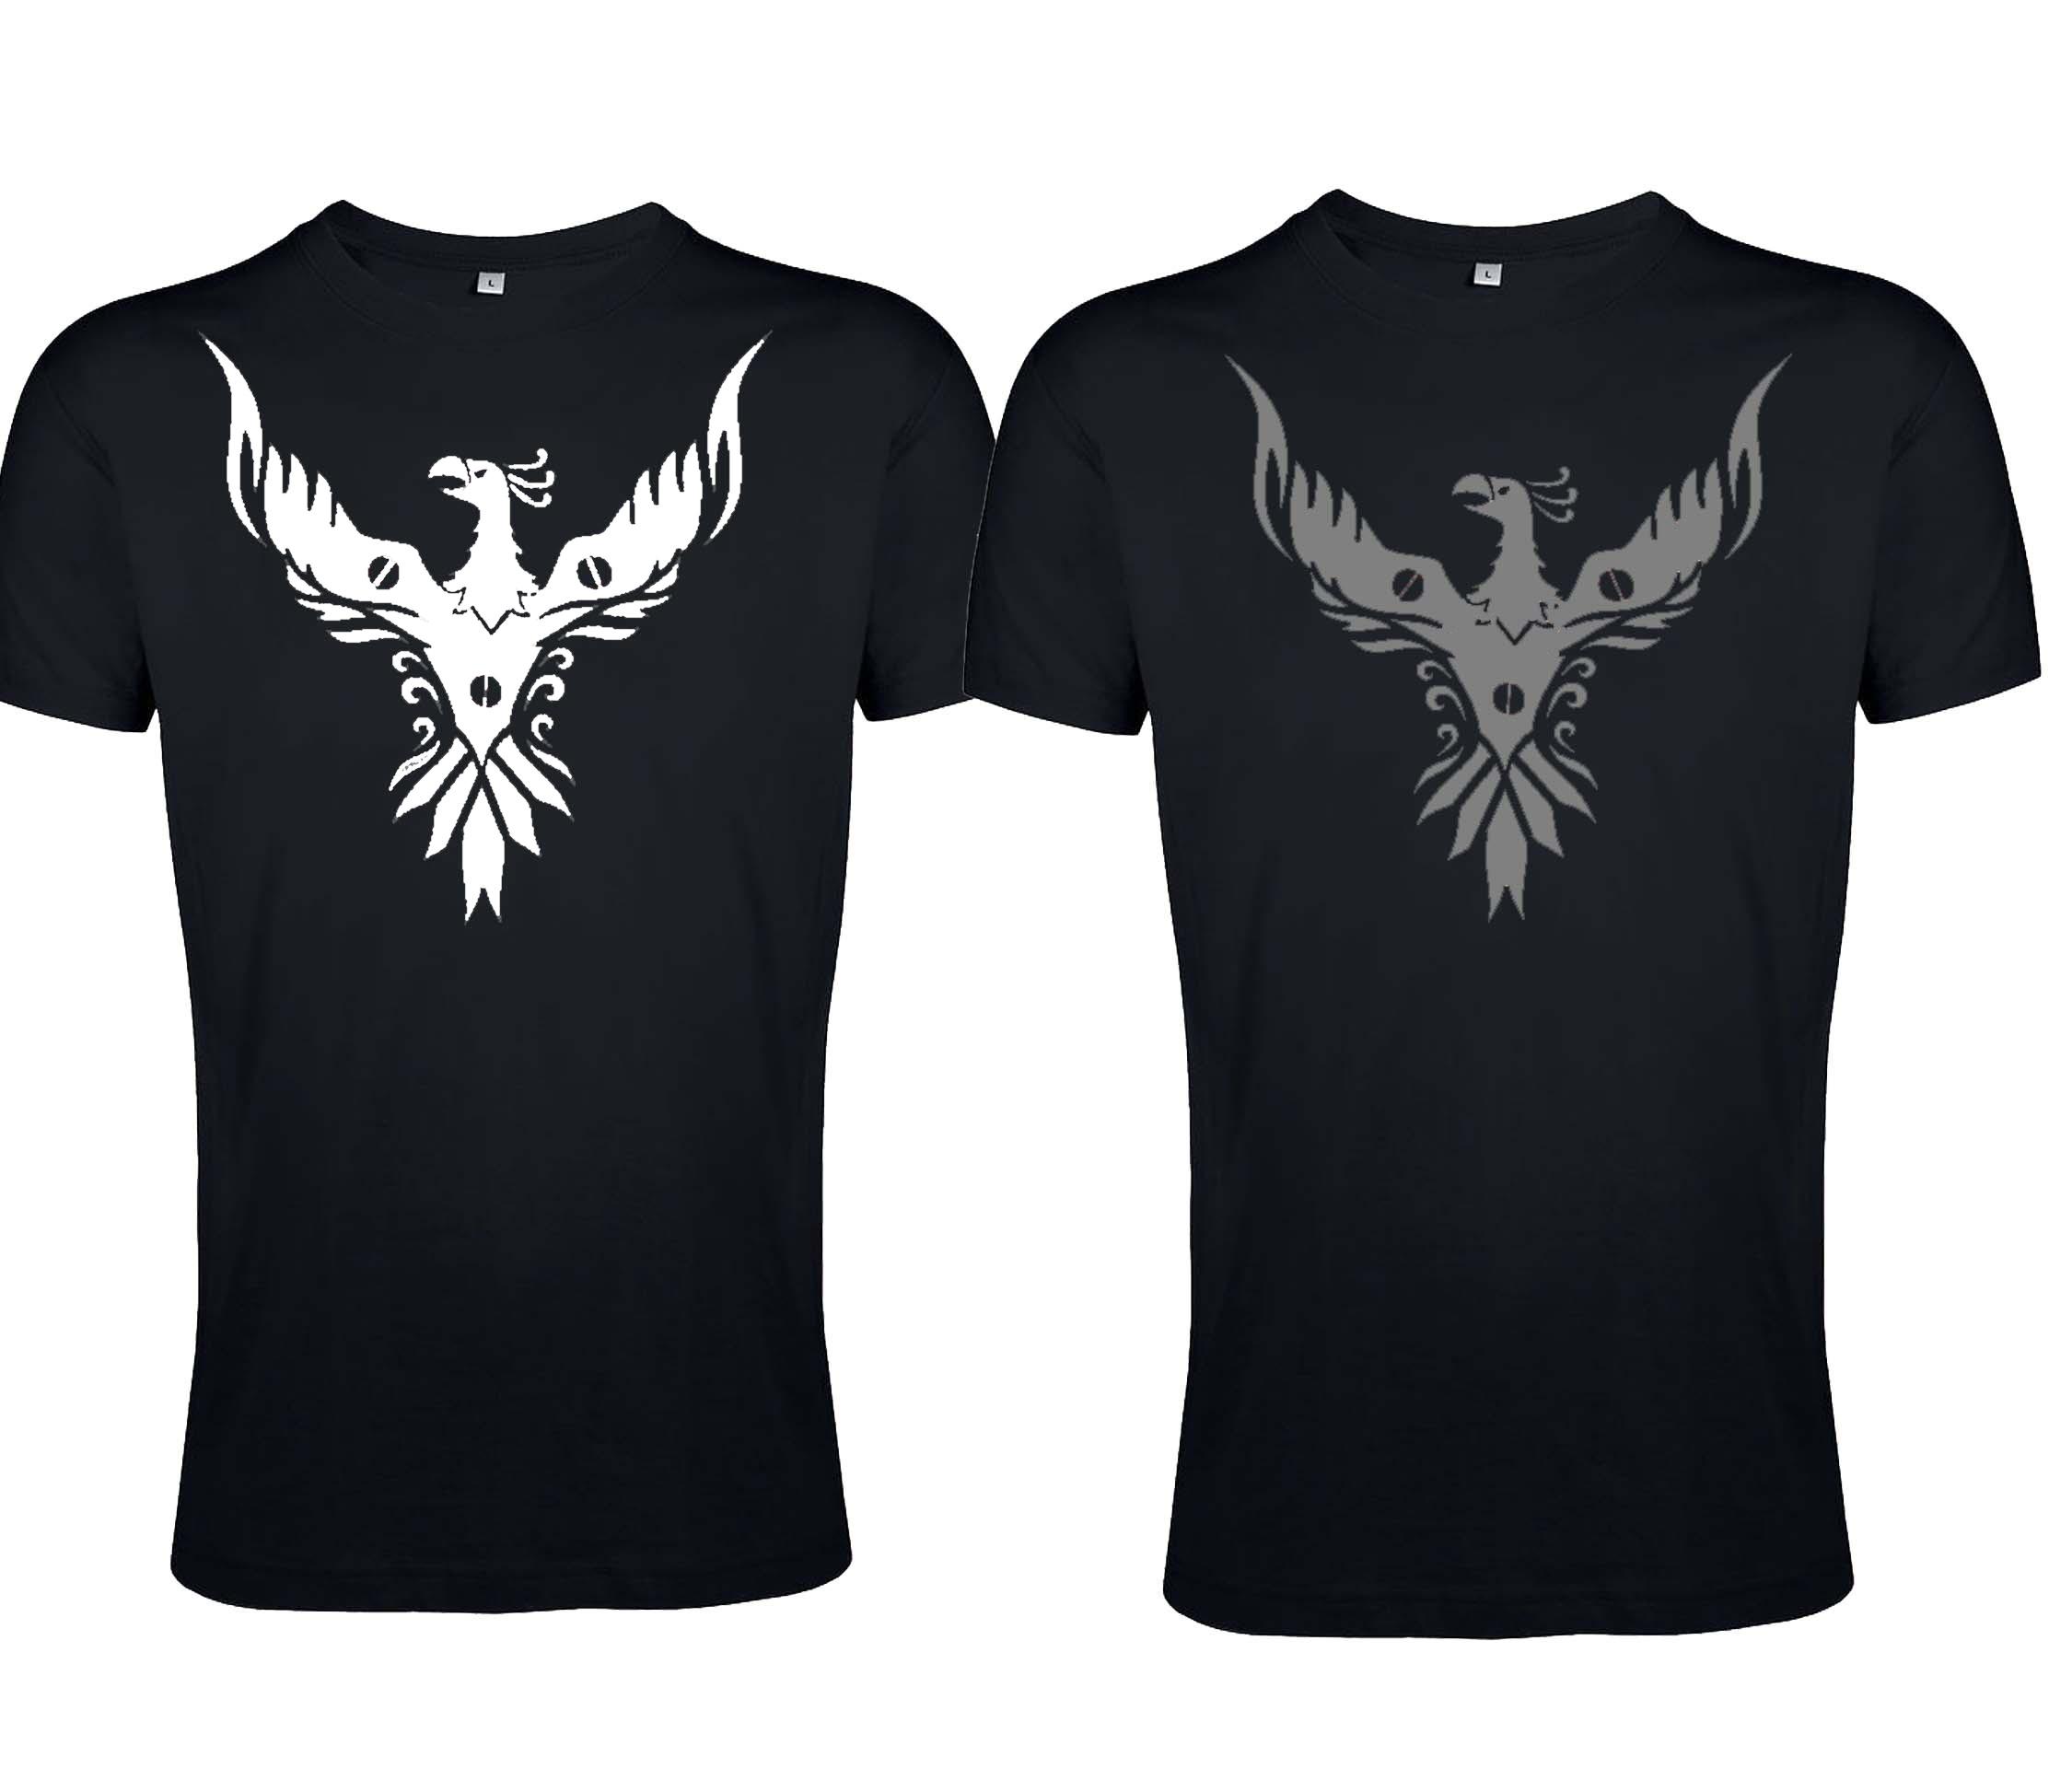 "T-Shirt von SONIC X Model "" Tekno Animals Phönix"""